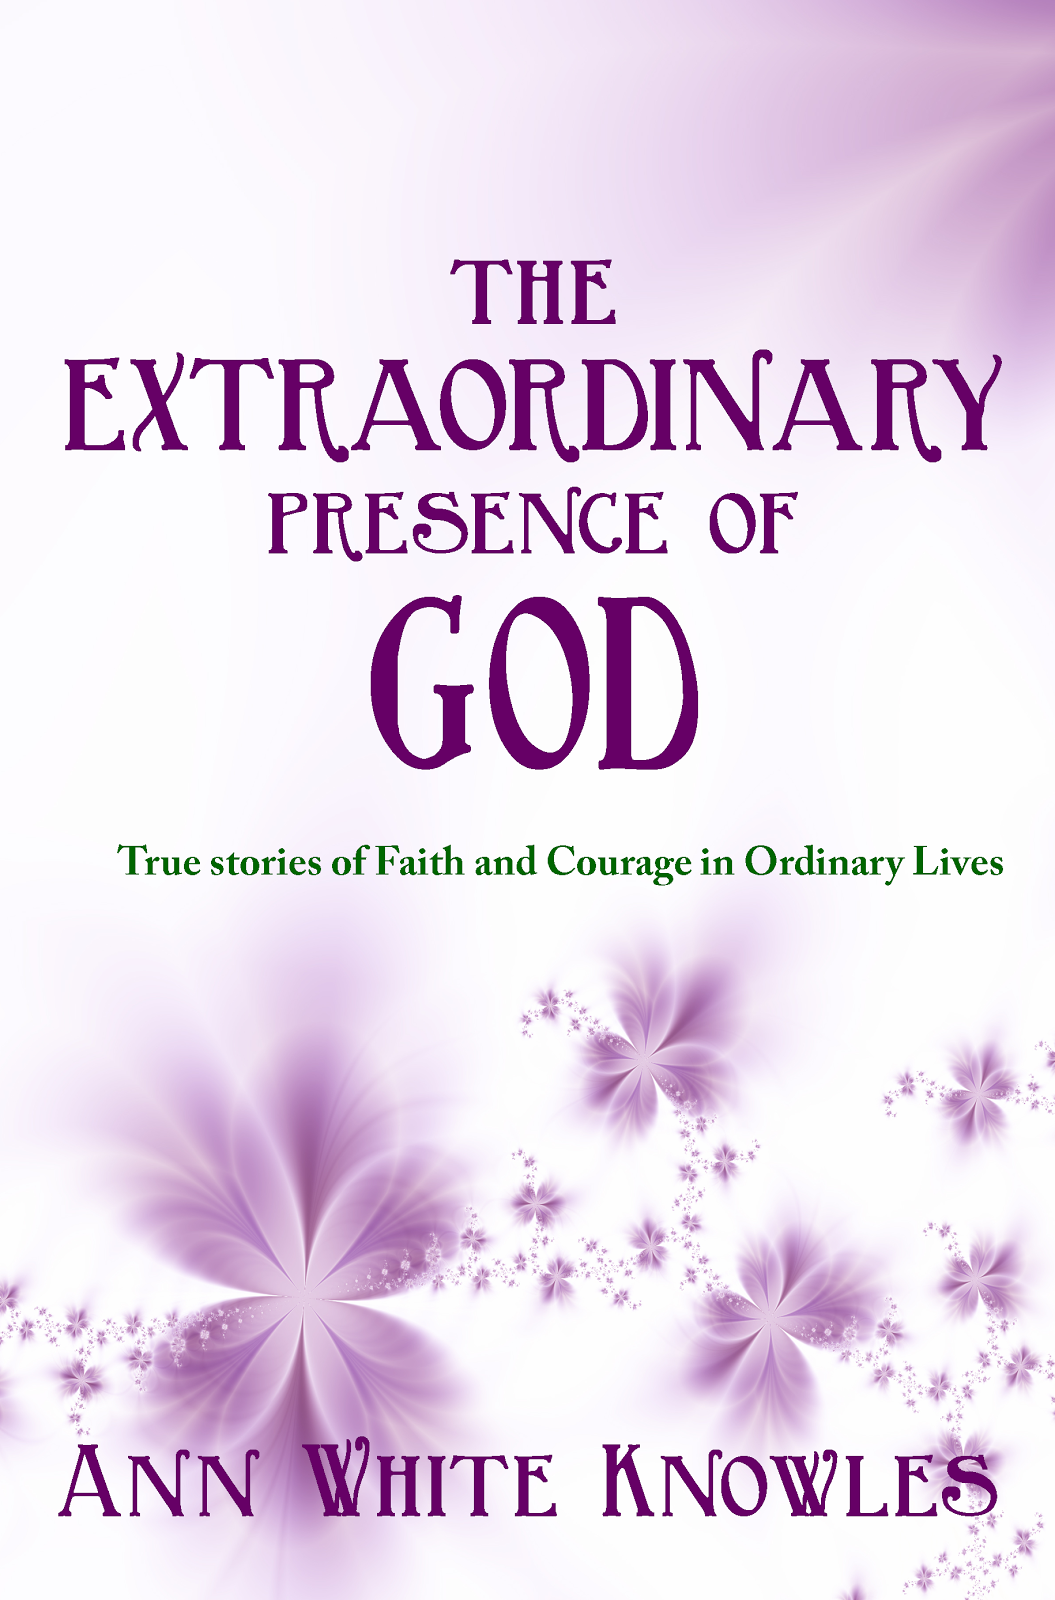 The Extraordinary Presence